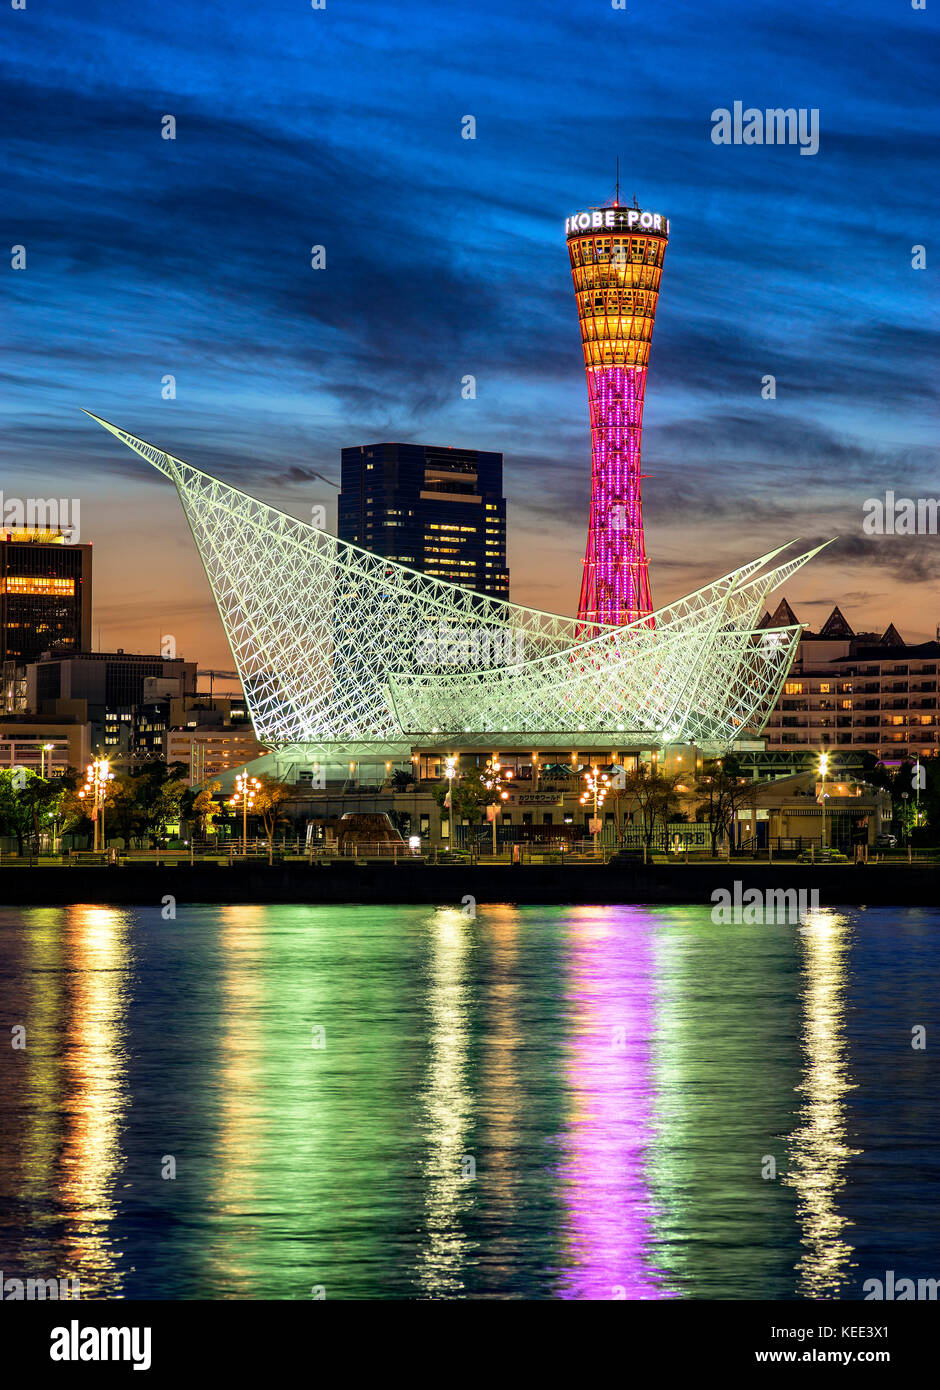 Japan, Honshu island, Kansai, Kobe, Port Tower and Meriken Park at dusk. - Stock Image